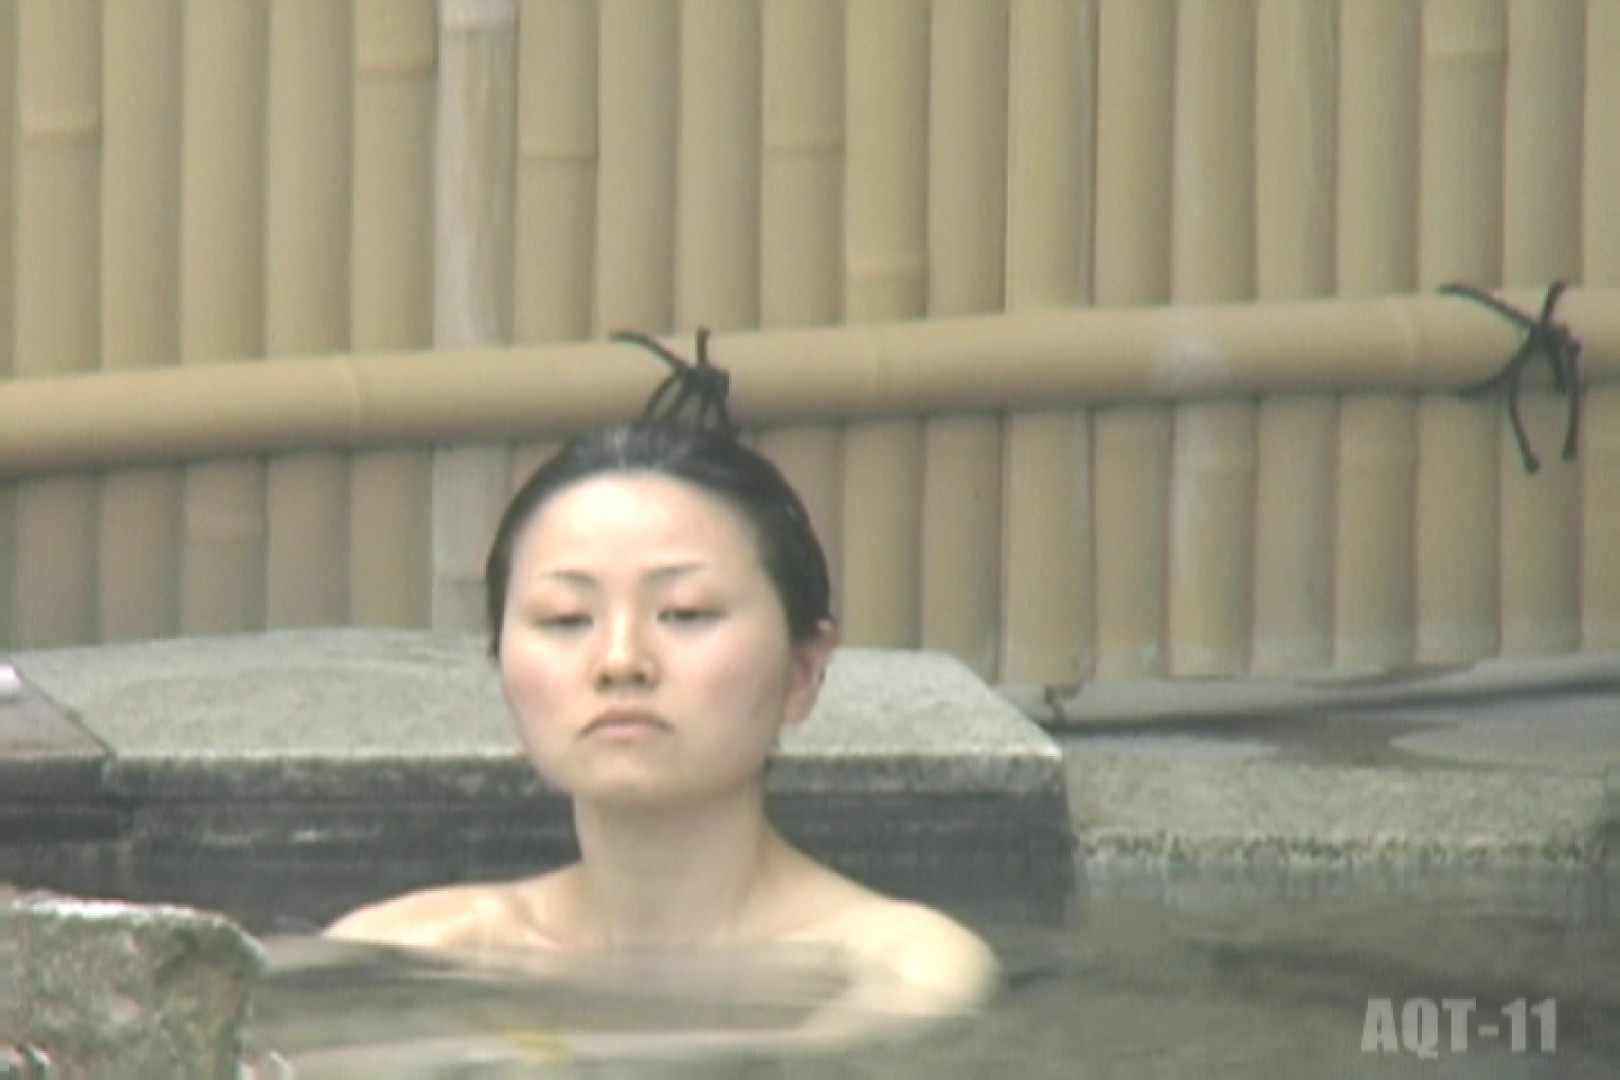 Aquaな露天風呂Vol.802 OLのプライベート   盗撮特撮  11pic 4